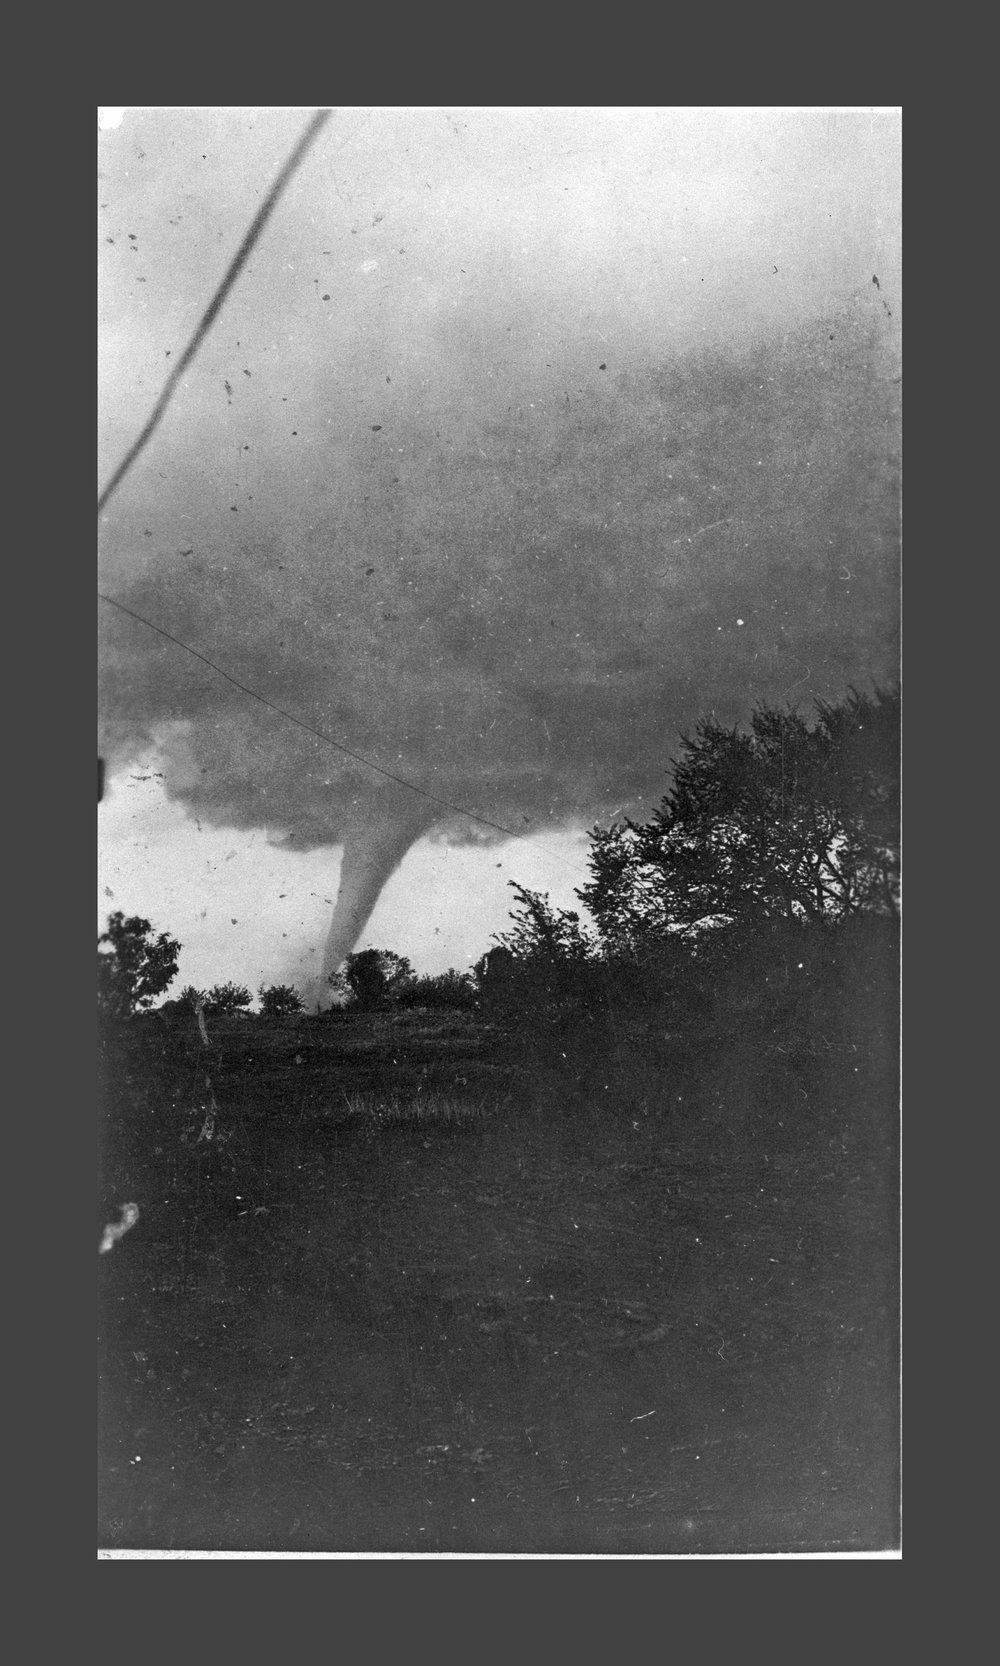 Tornado, Jefferson County, Kansas